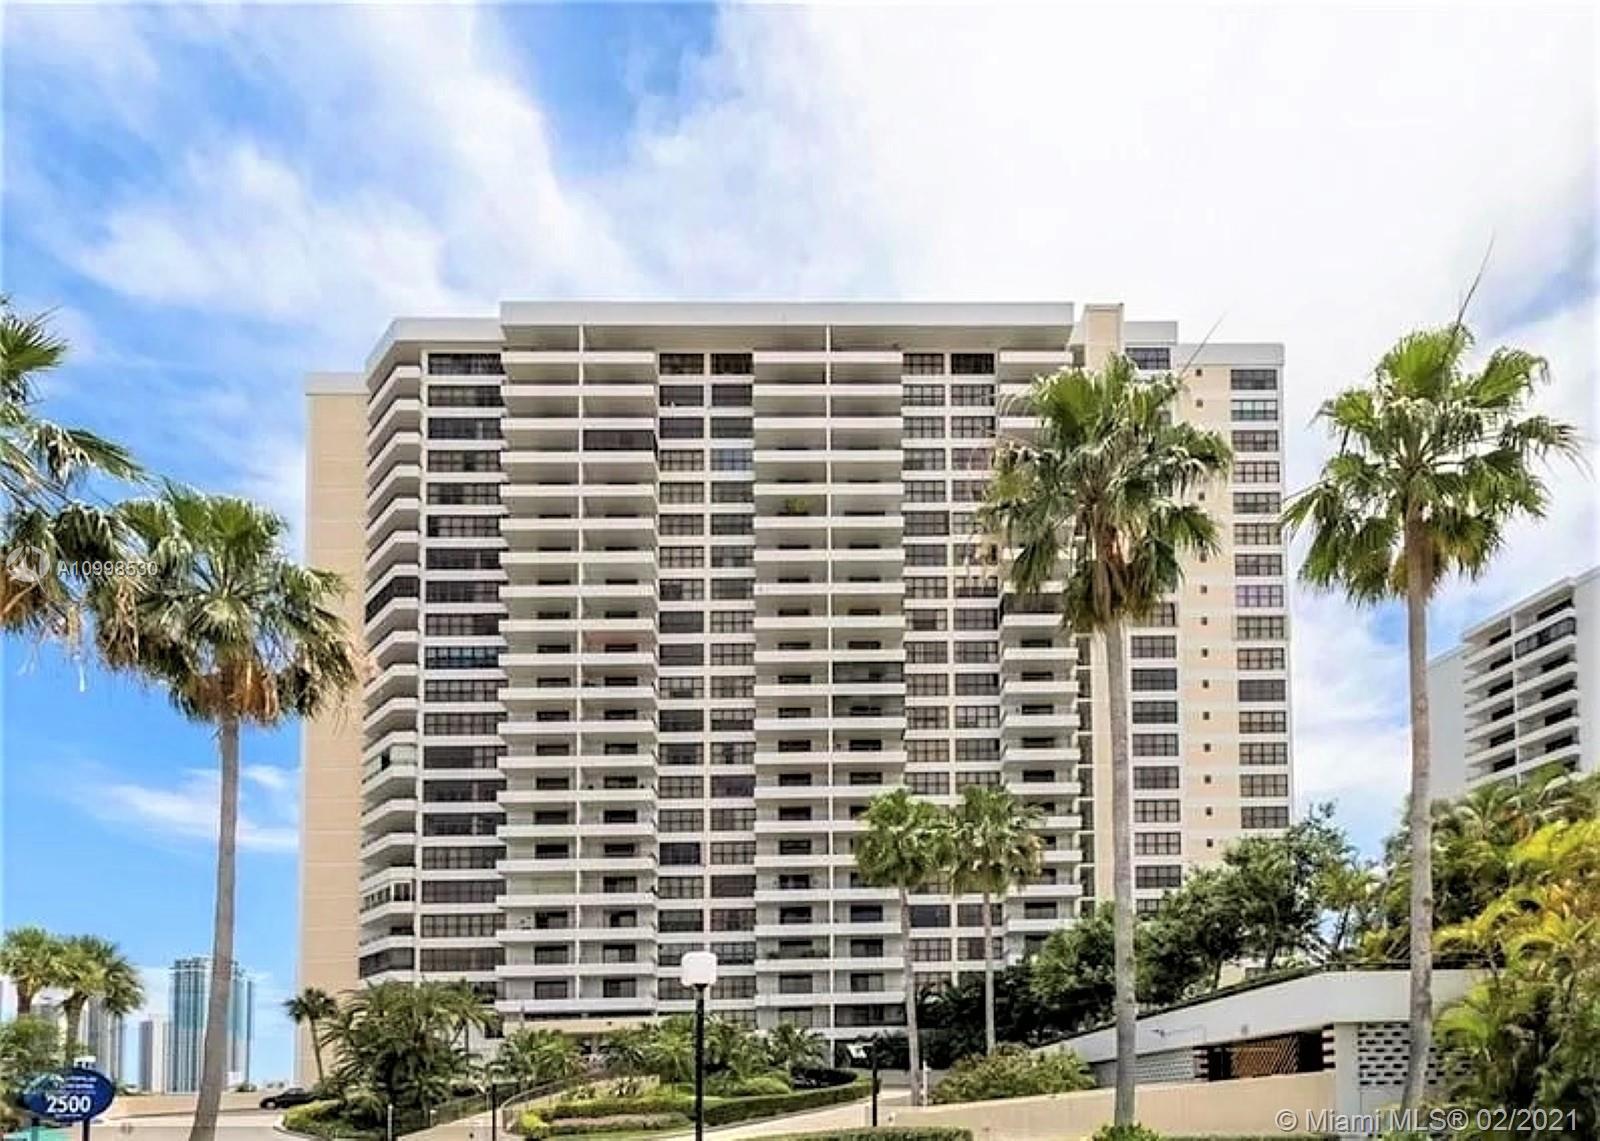 Olympus C #711 - 2500 Parkview Dr #711, Hallandale Beach, FL 33009